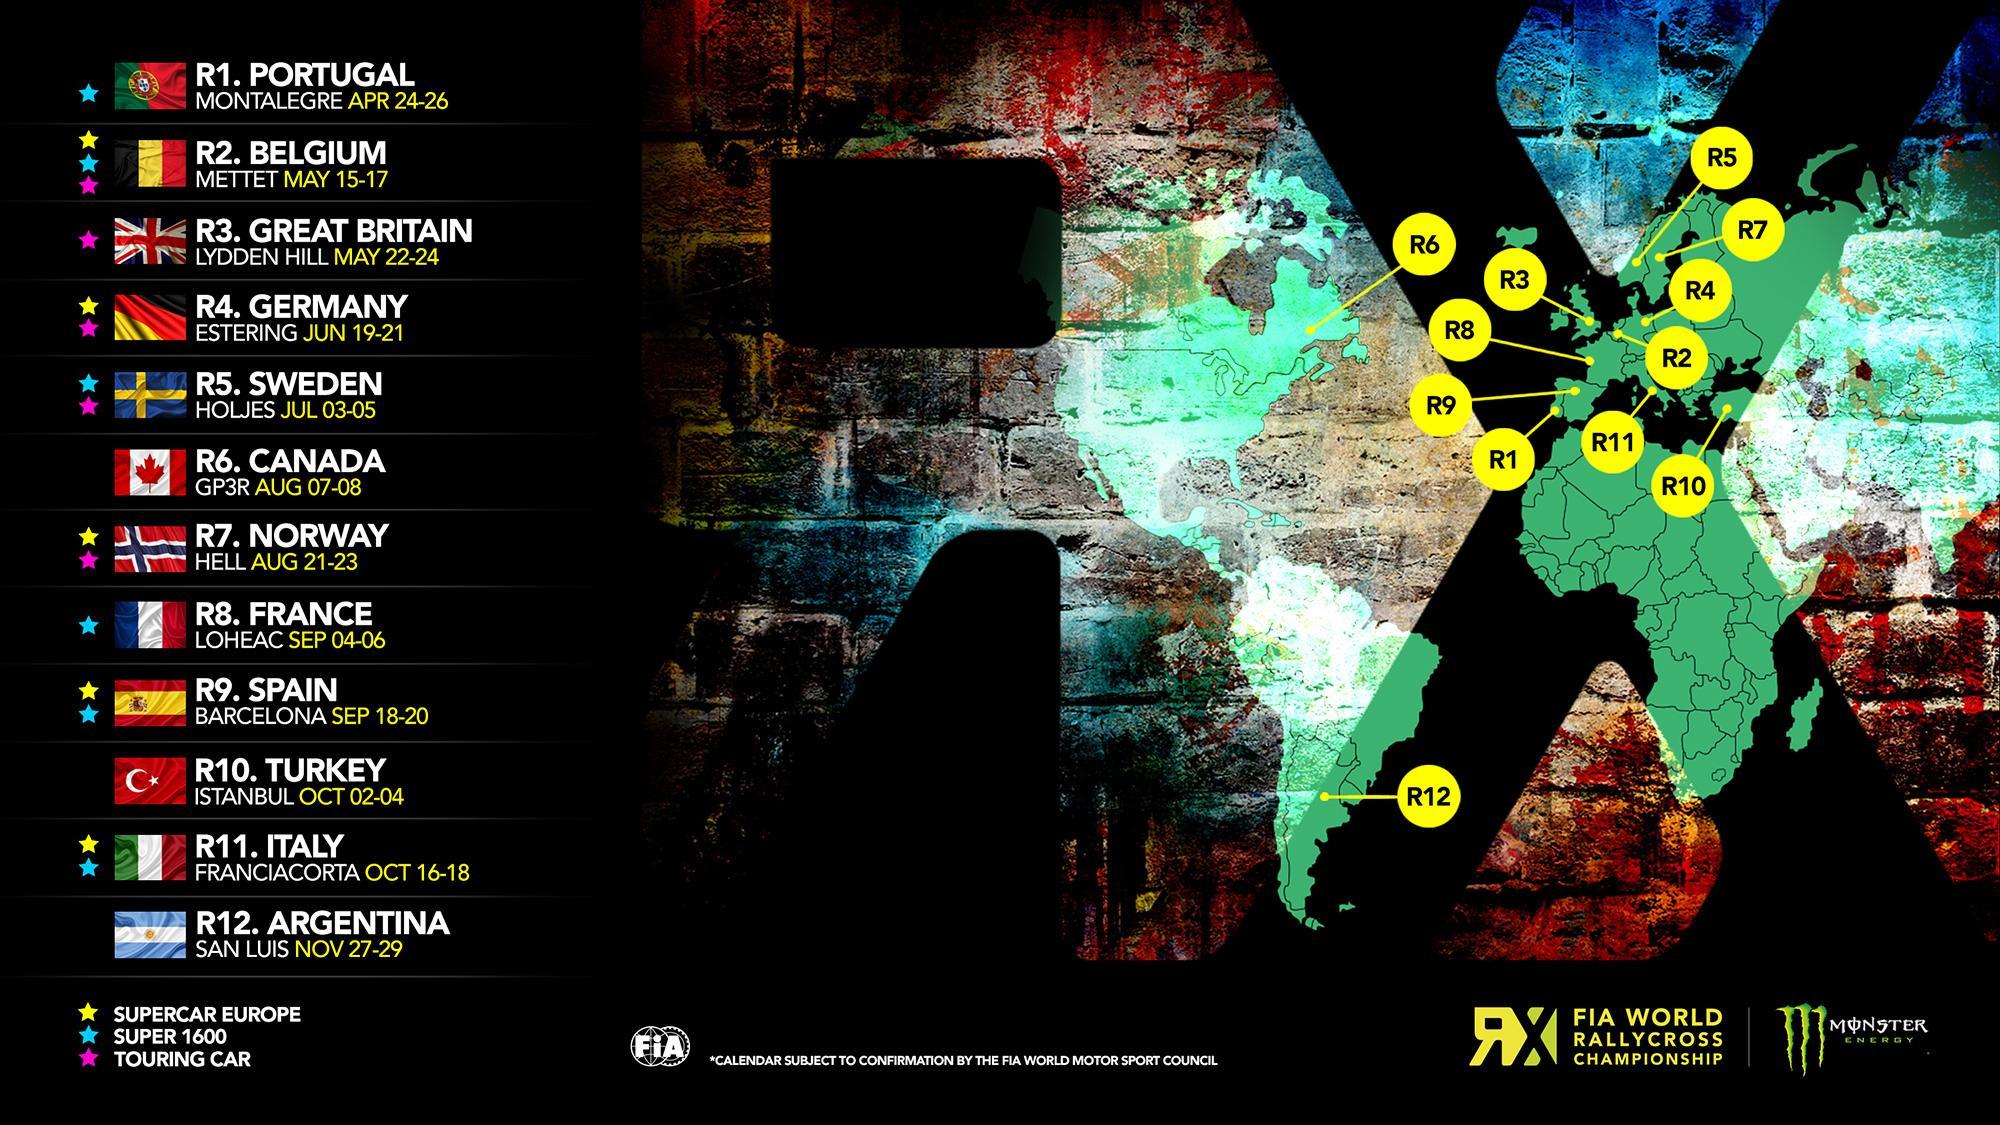 FIA World Rallycross RX (et autres championnats) - Page 3 B2PHQk7CEAInY90